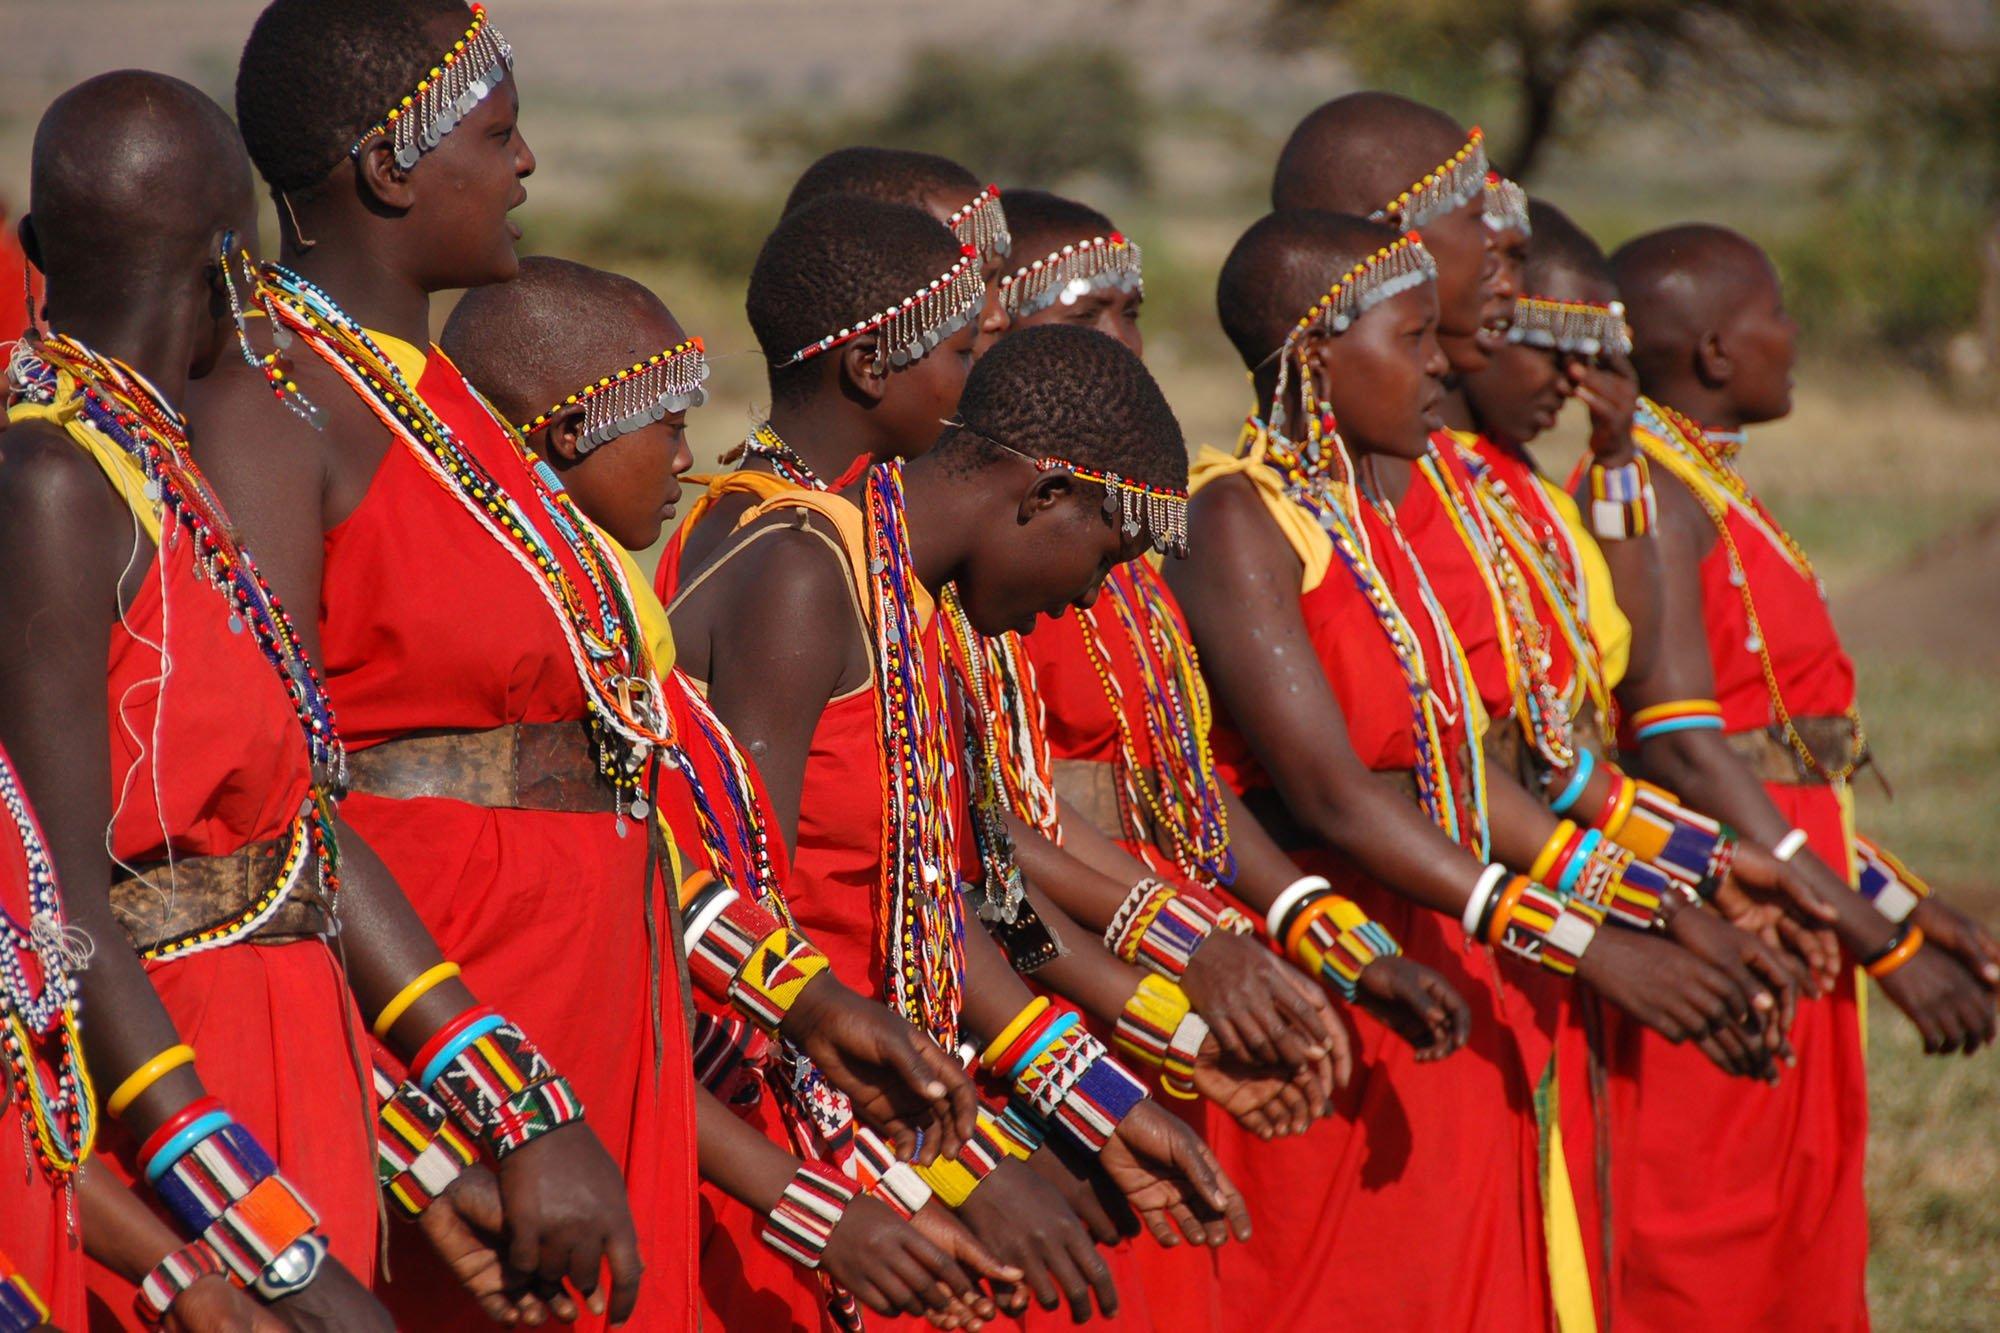 safari-in-kenia-rode-kleding